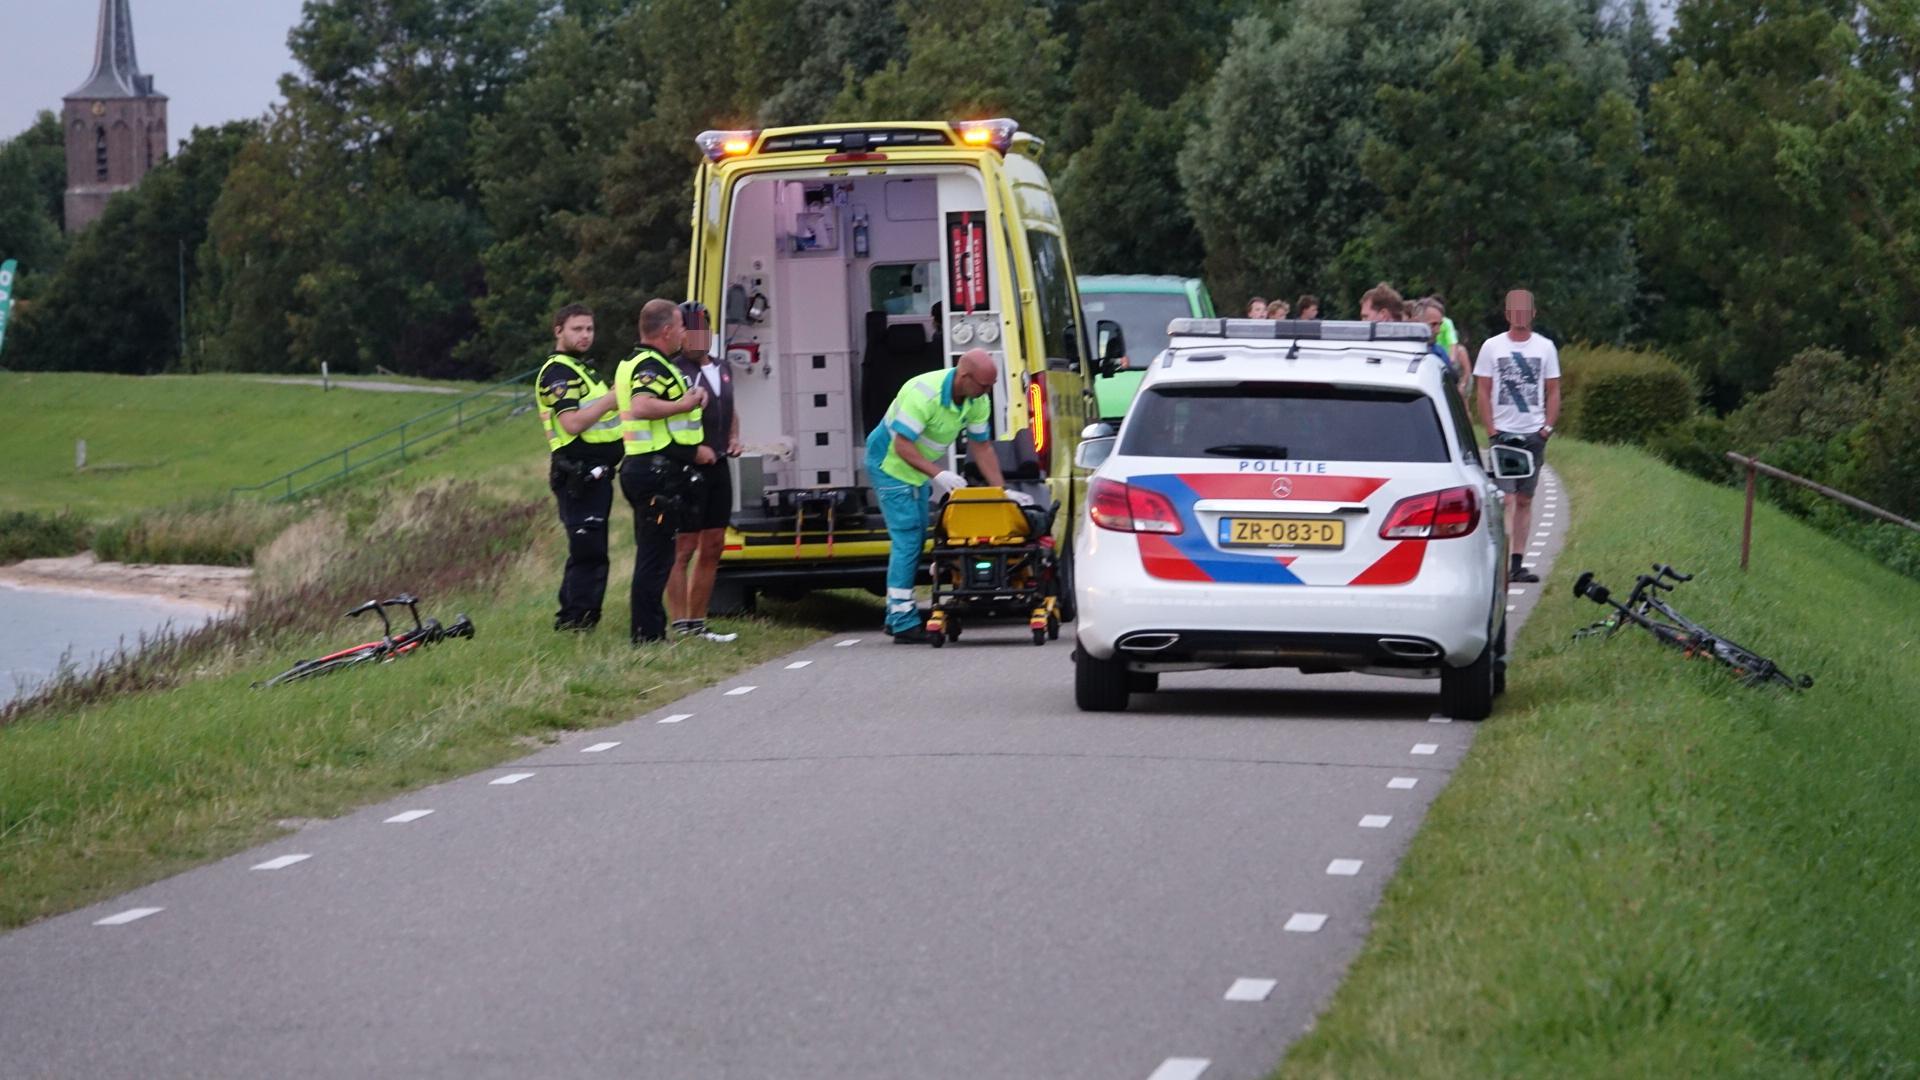 Wielrenner gewond bij botsing in Schellinkhout, automobilist rijdt door